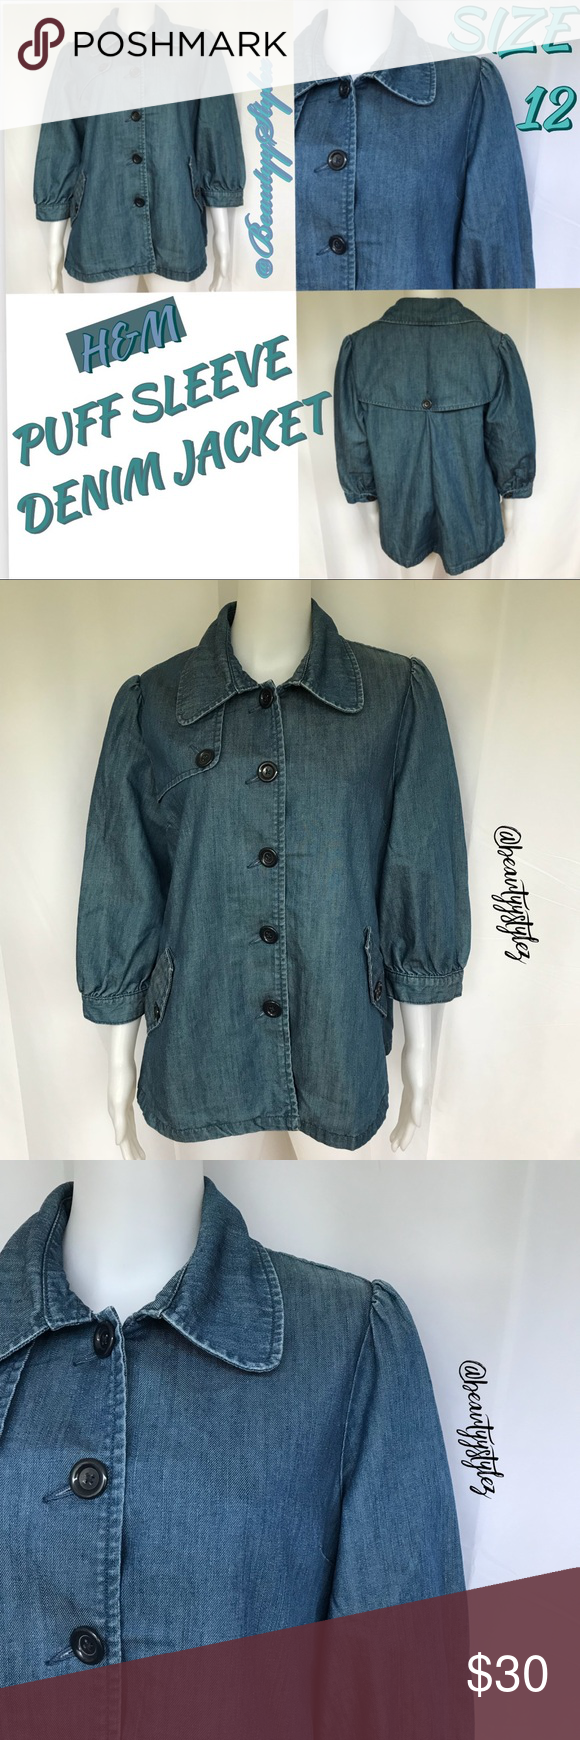 03ac183534 H&M Blue Denim Puff 3/4 Sleeve Jacket Size 12 WORN ONCE‼ H&M ...